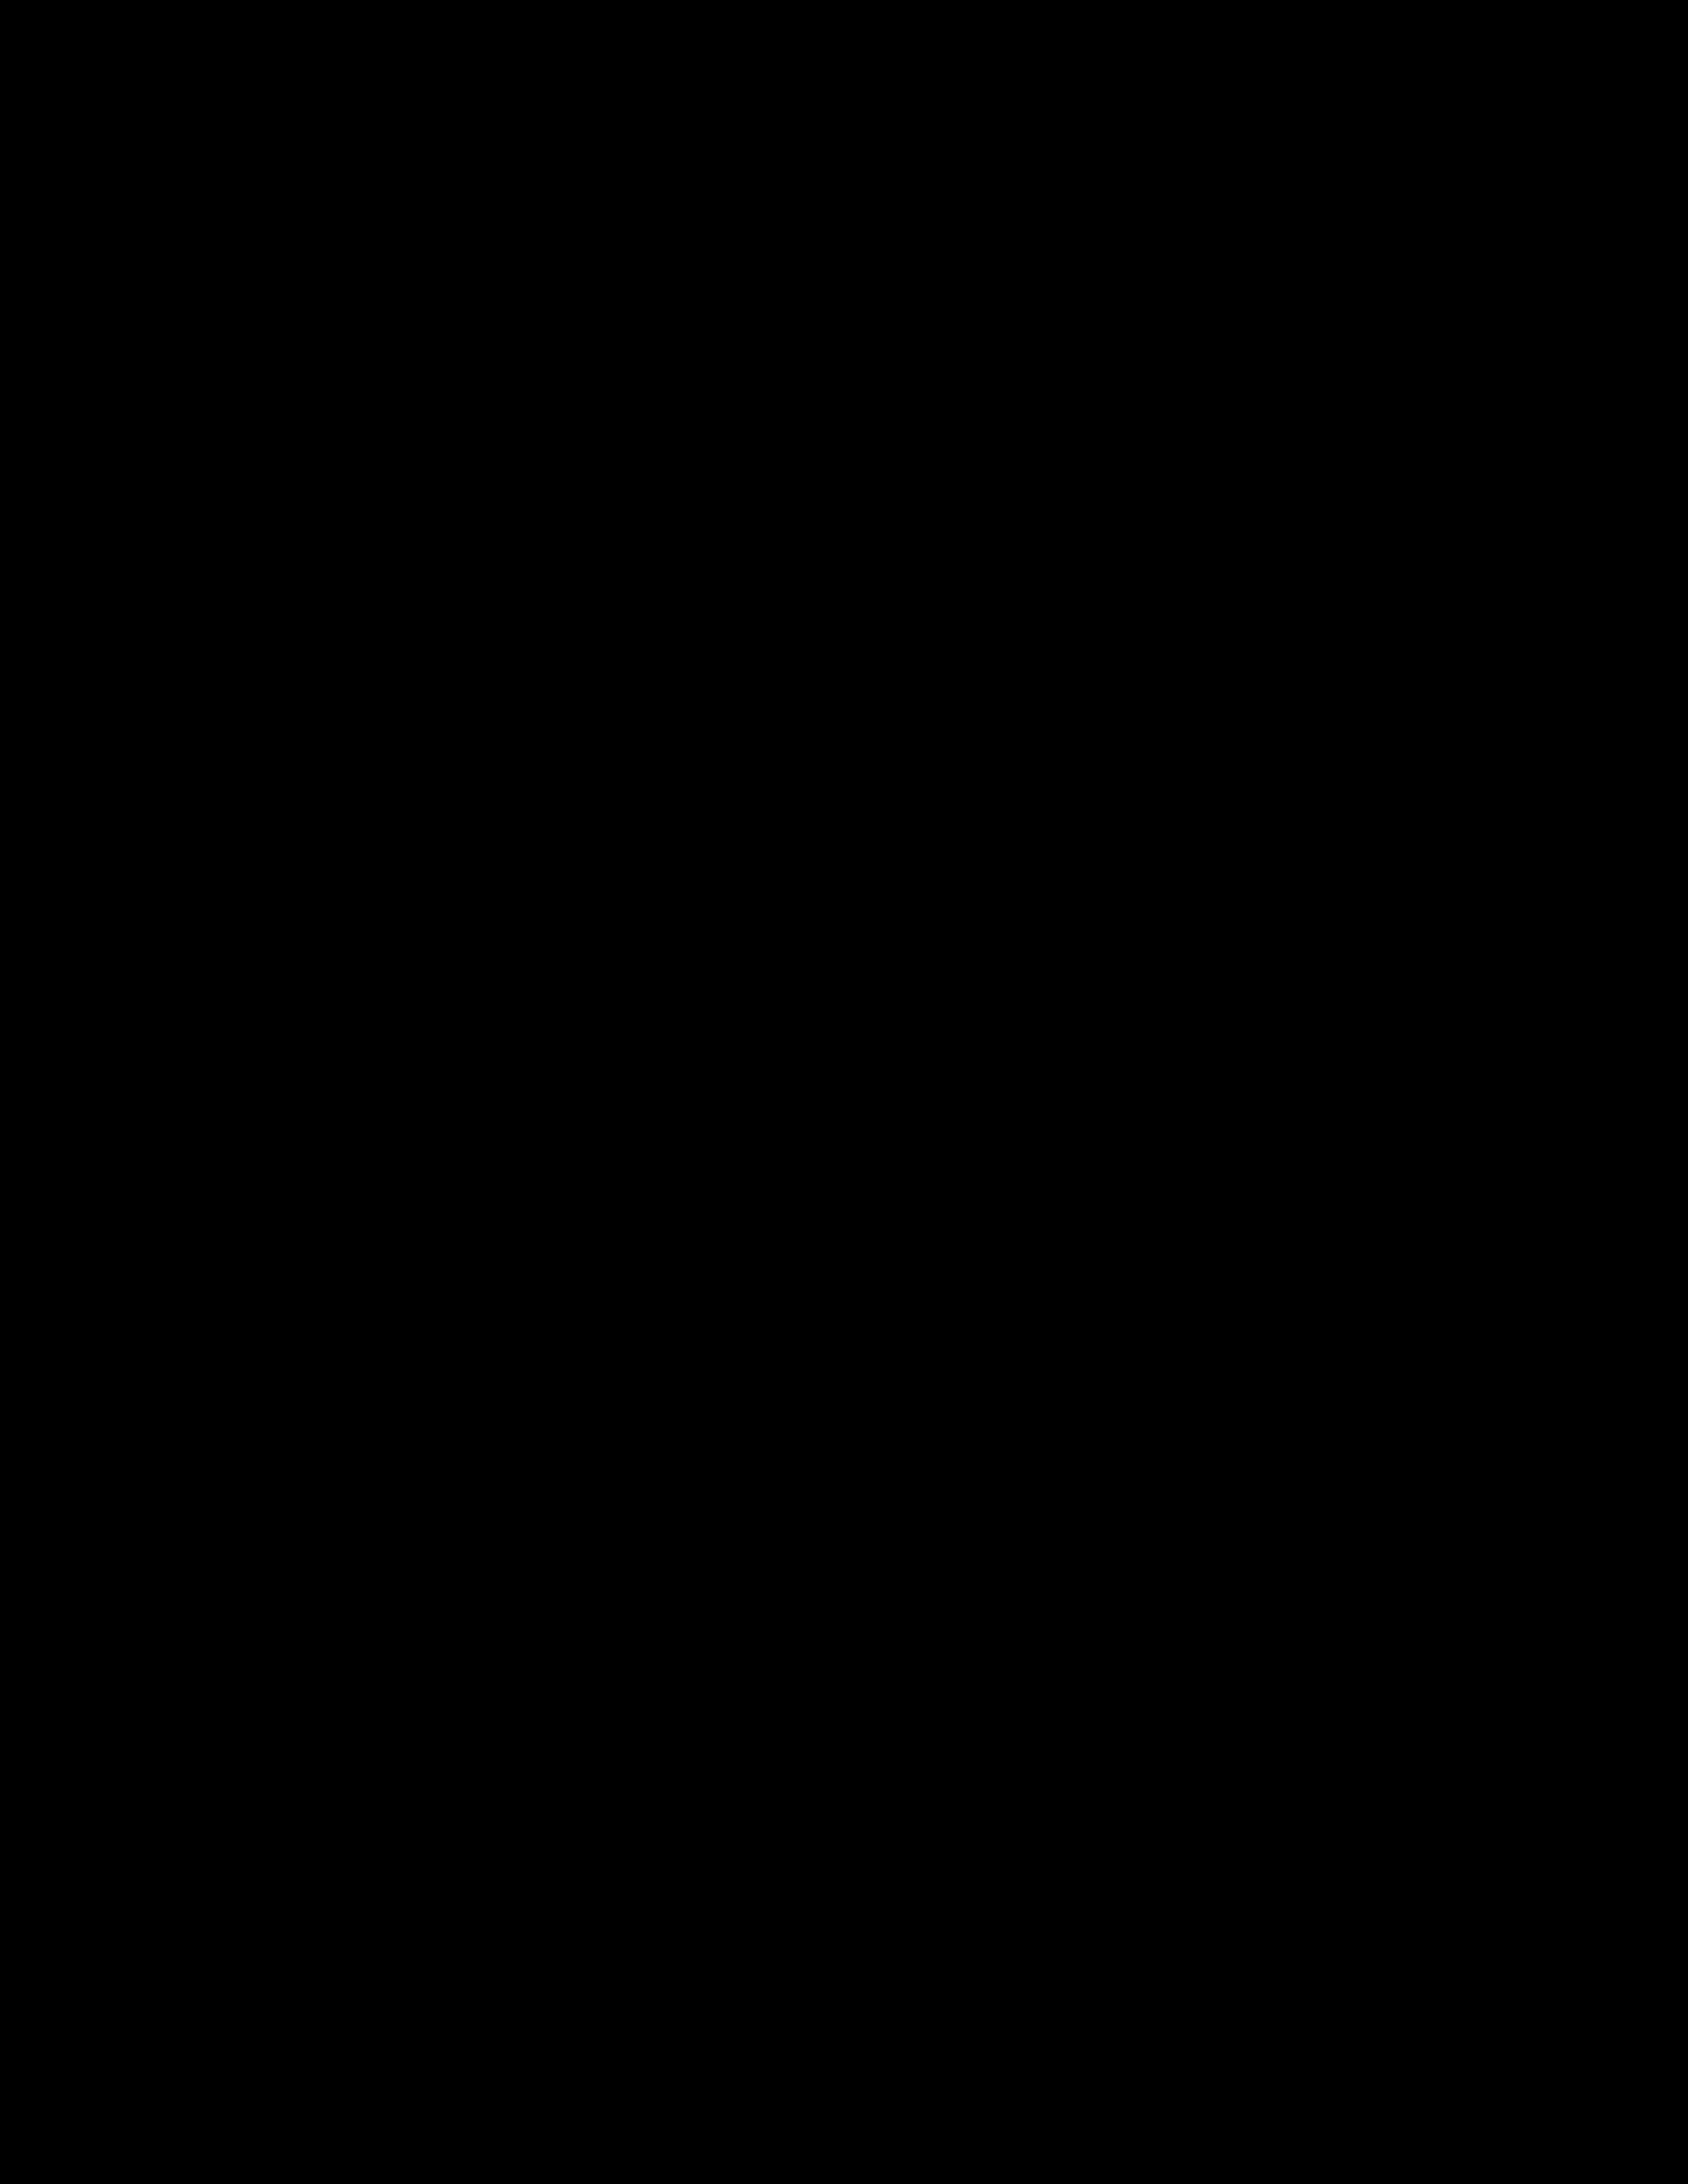 Thumb clipart neutral. File gender svg wikimedia